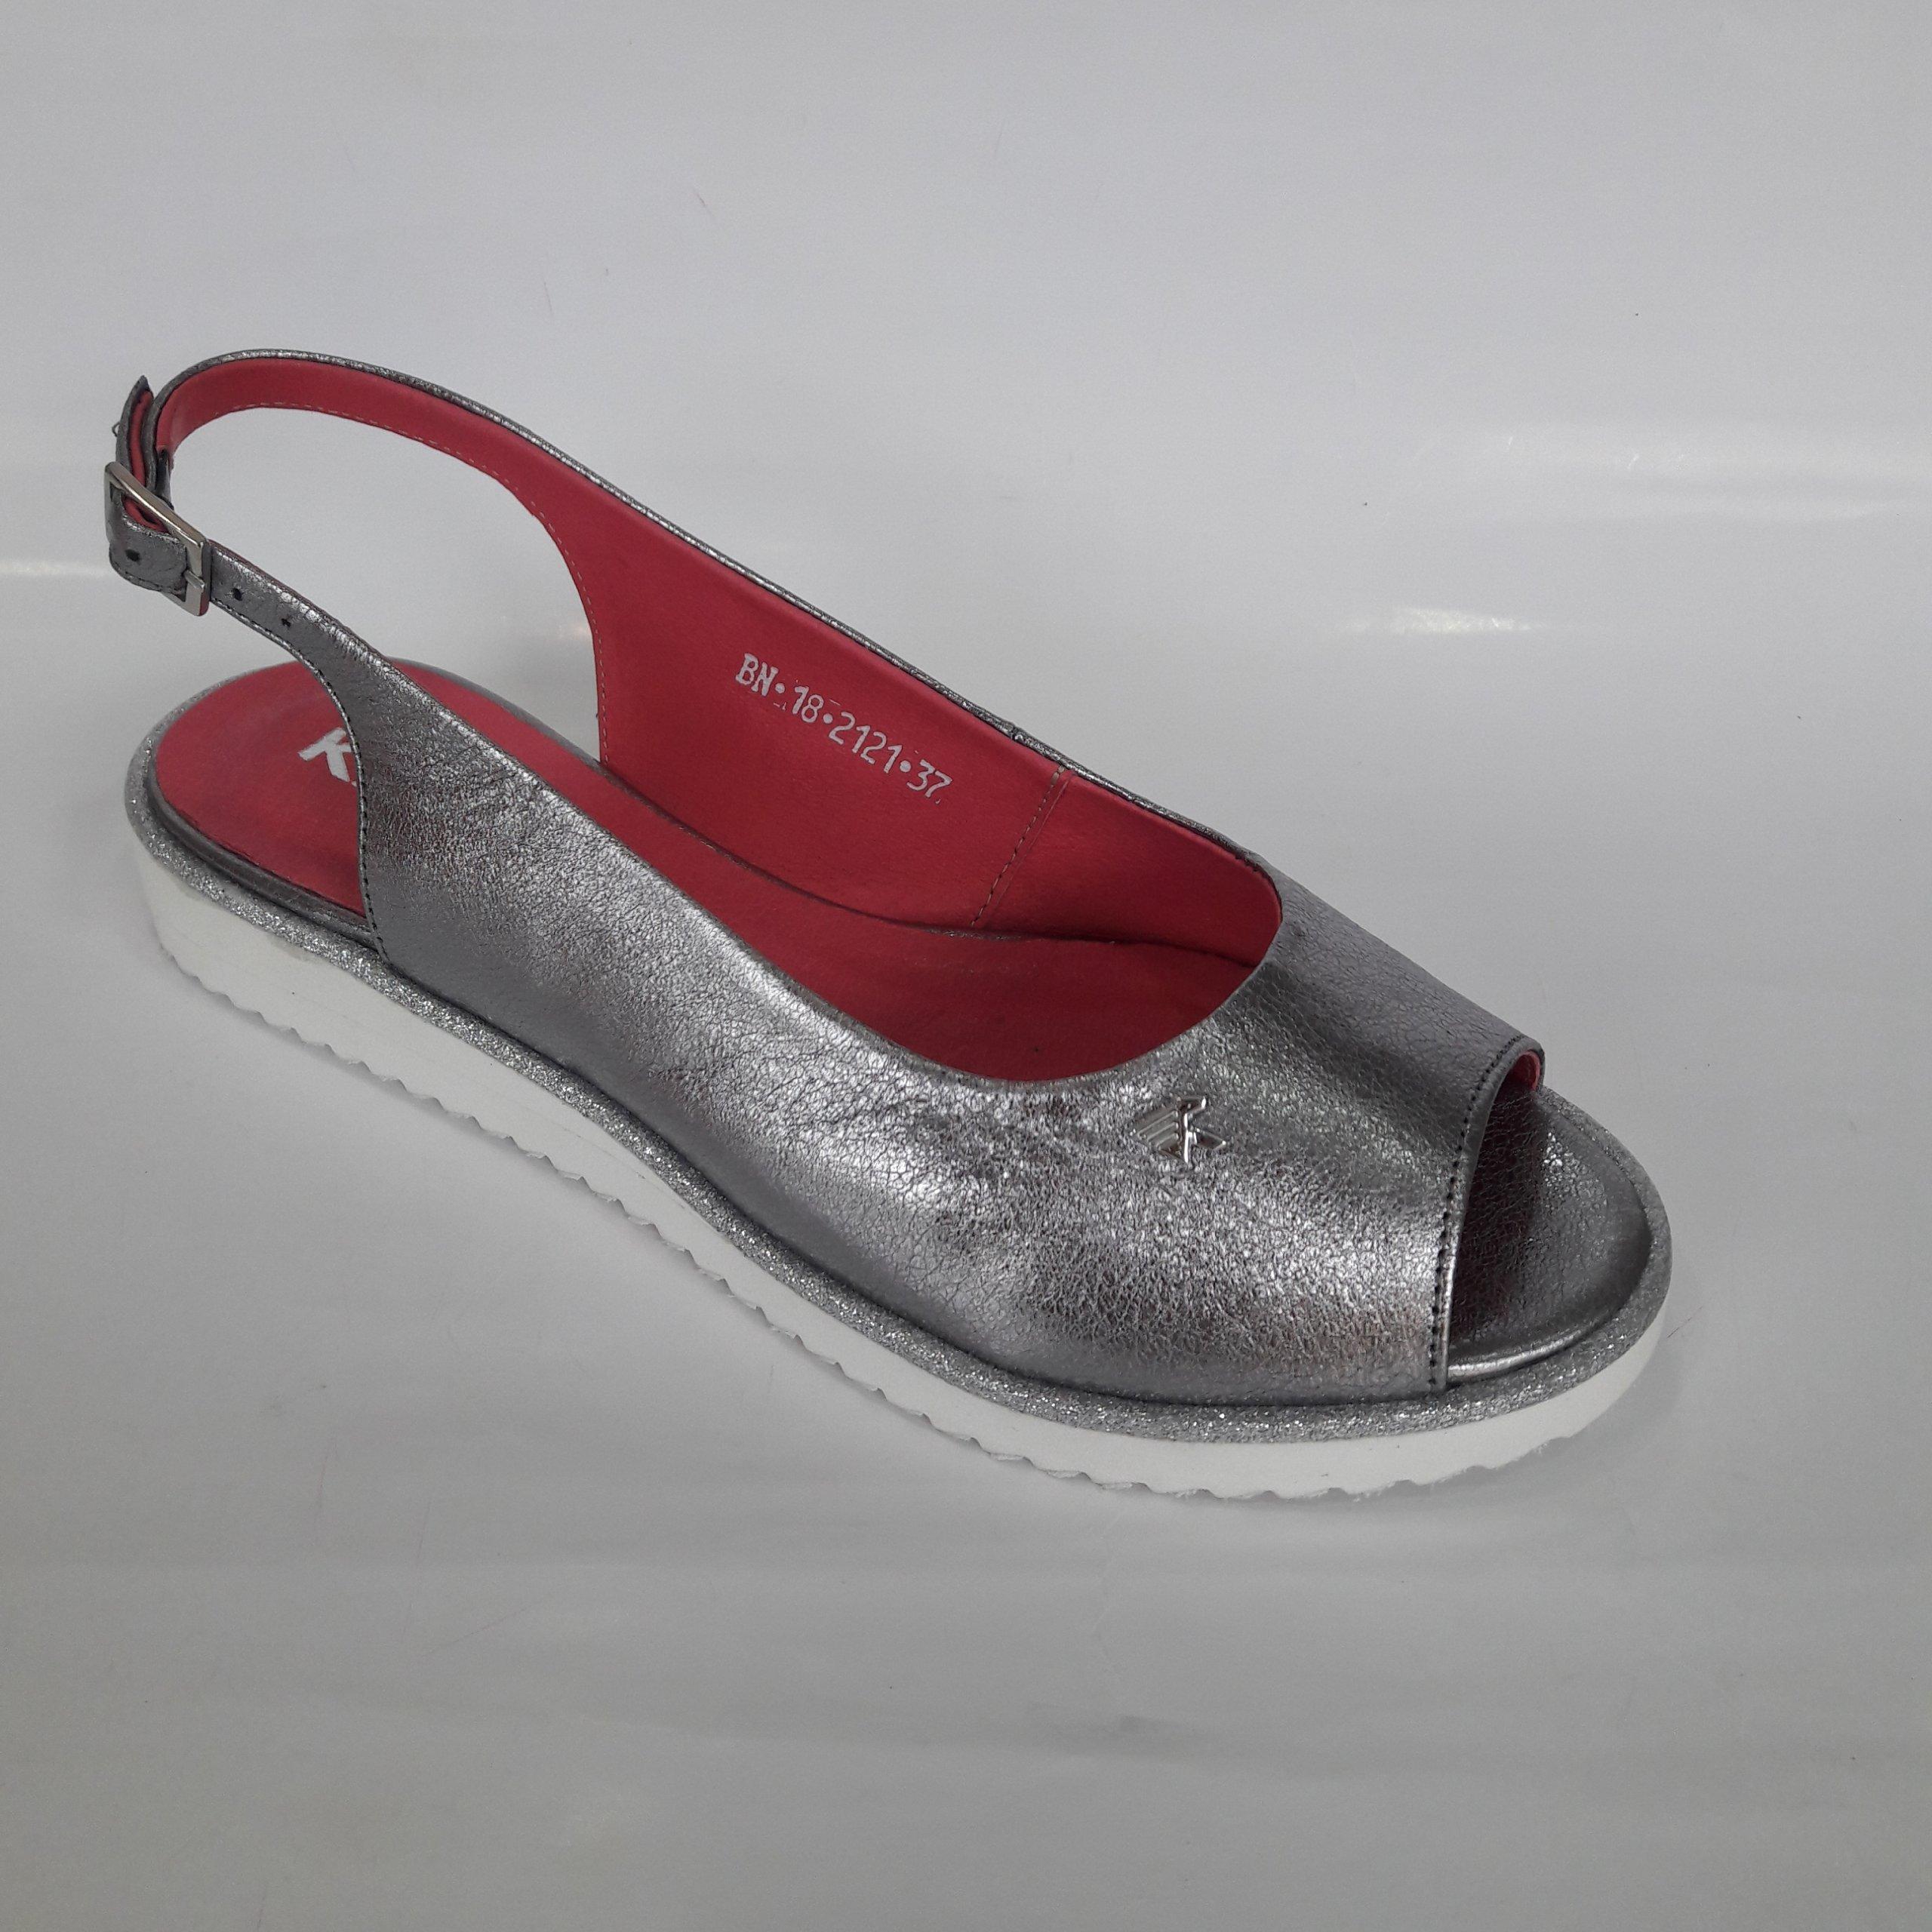 5ff9e53d837f6 Karino 2121 sandały skóra srebrne róż WYPRZEDAŻ 38 - 7409909078 ...